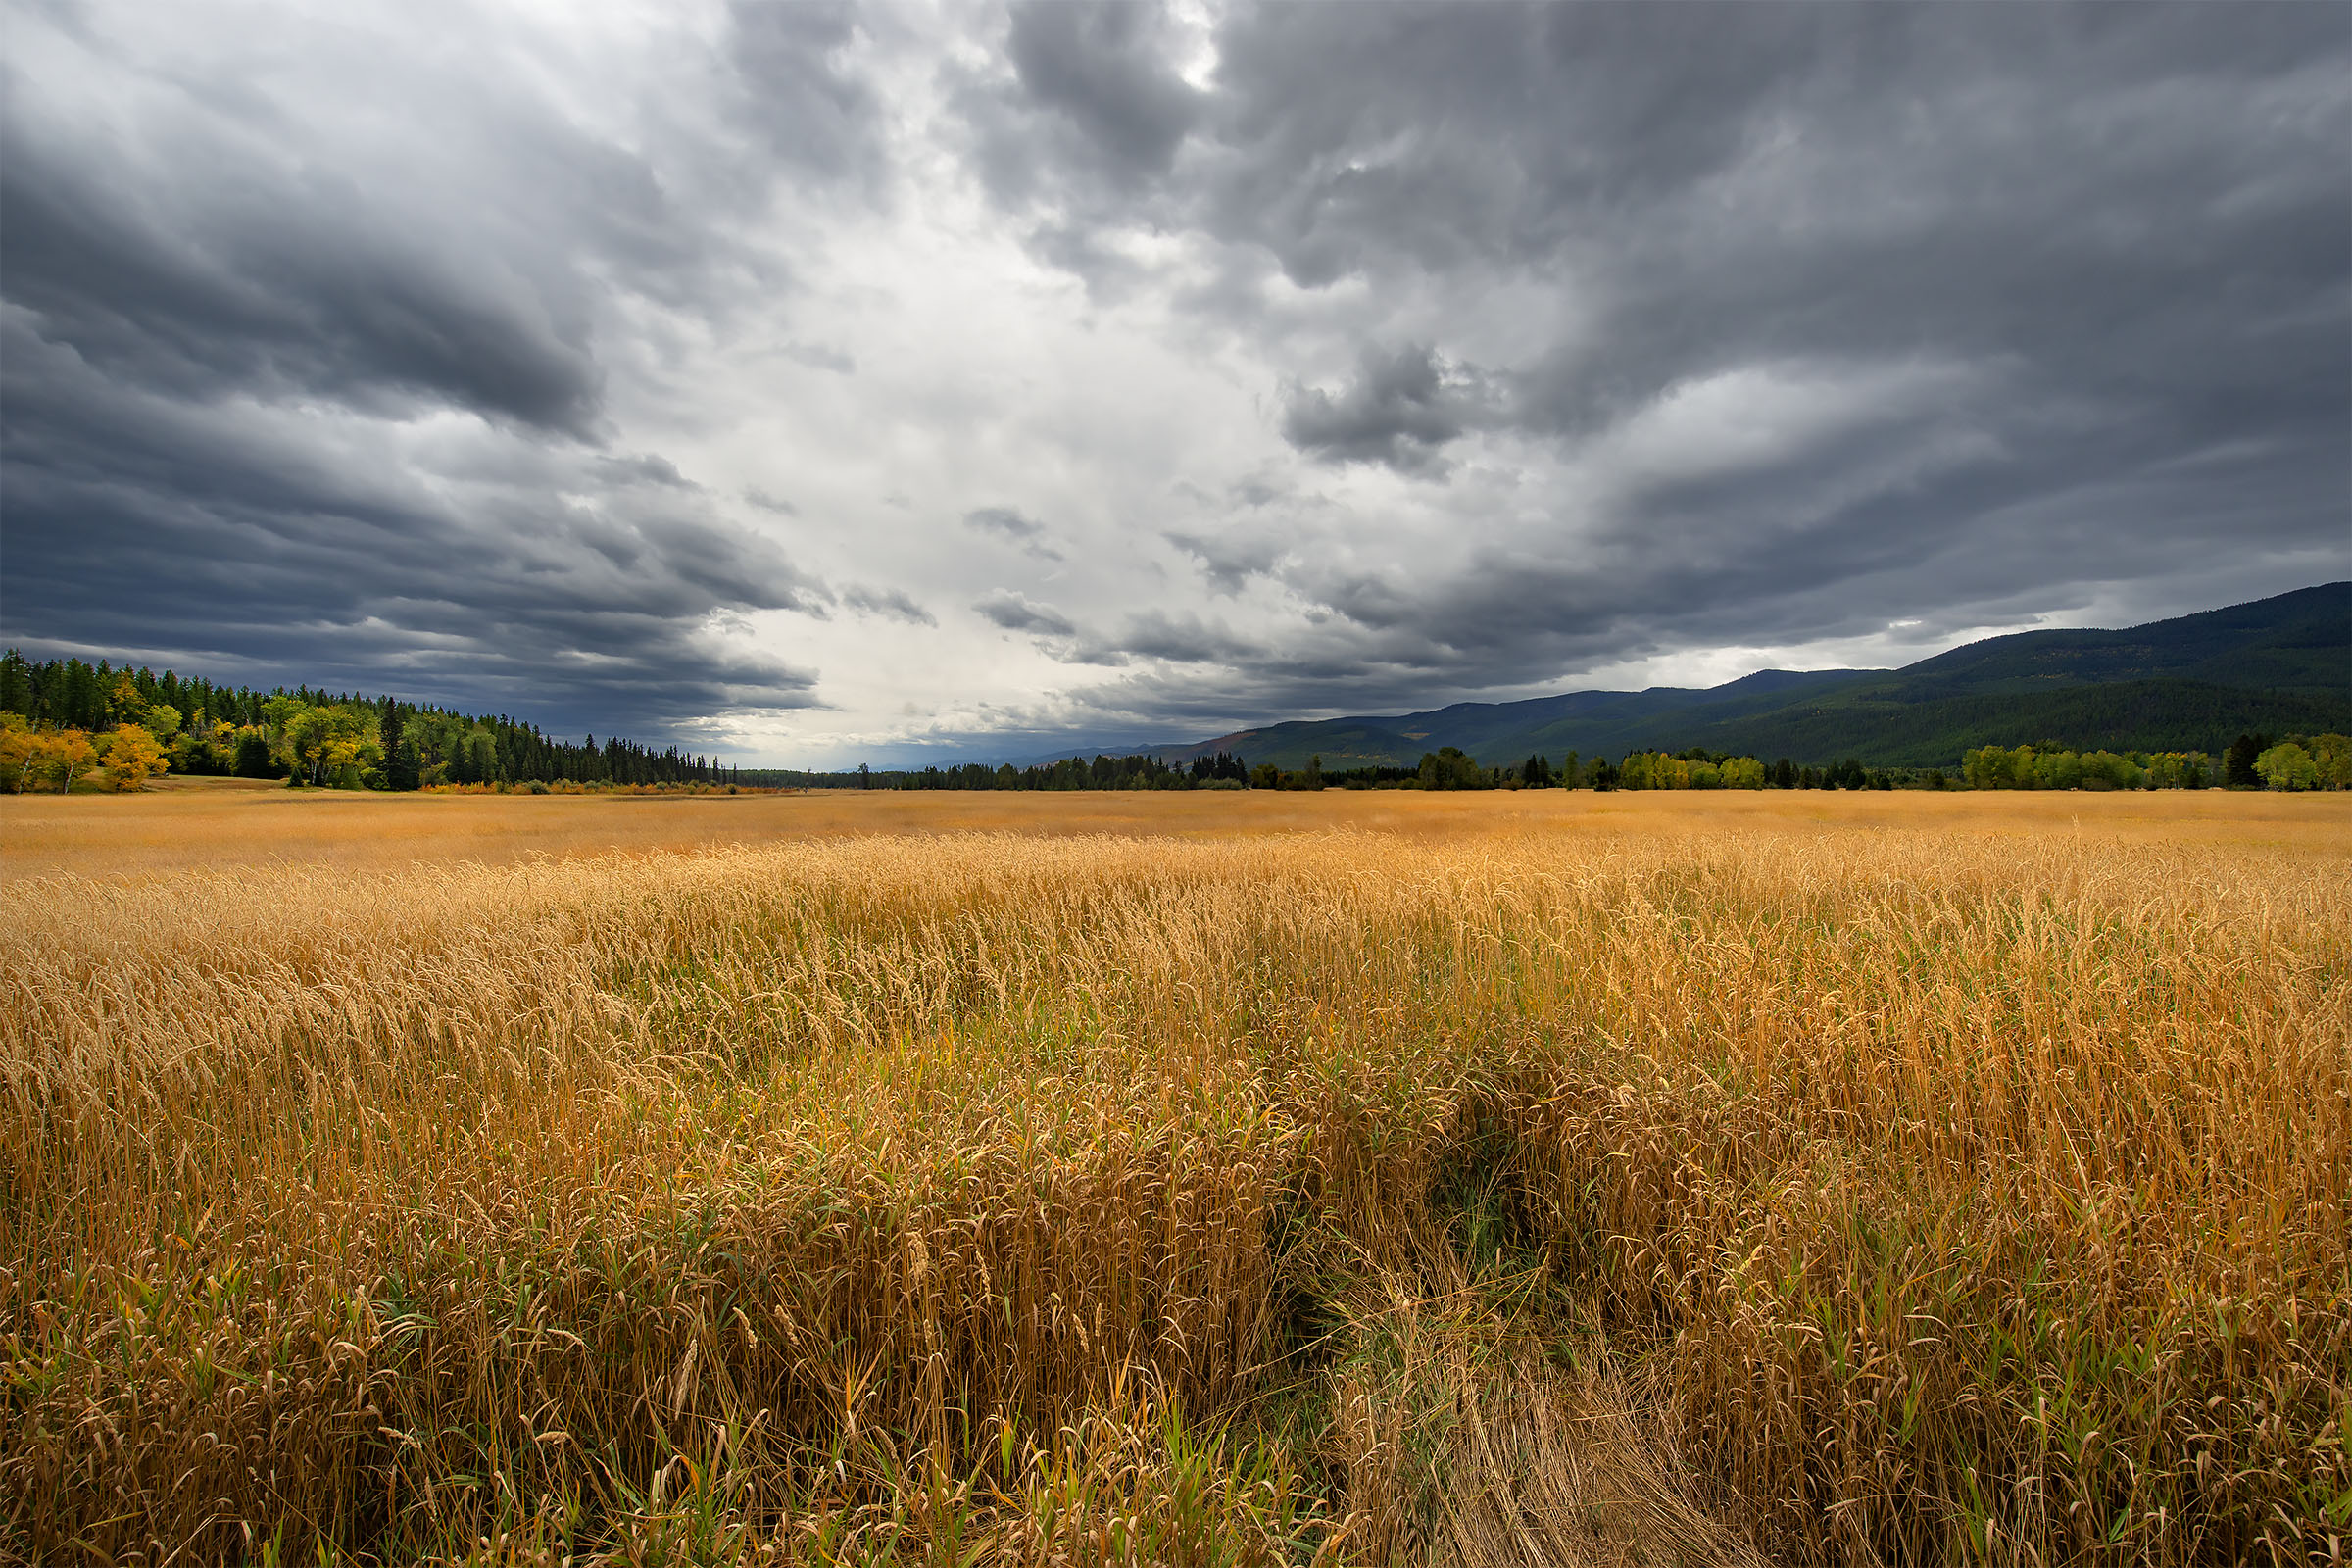 Grass_and_sky_1